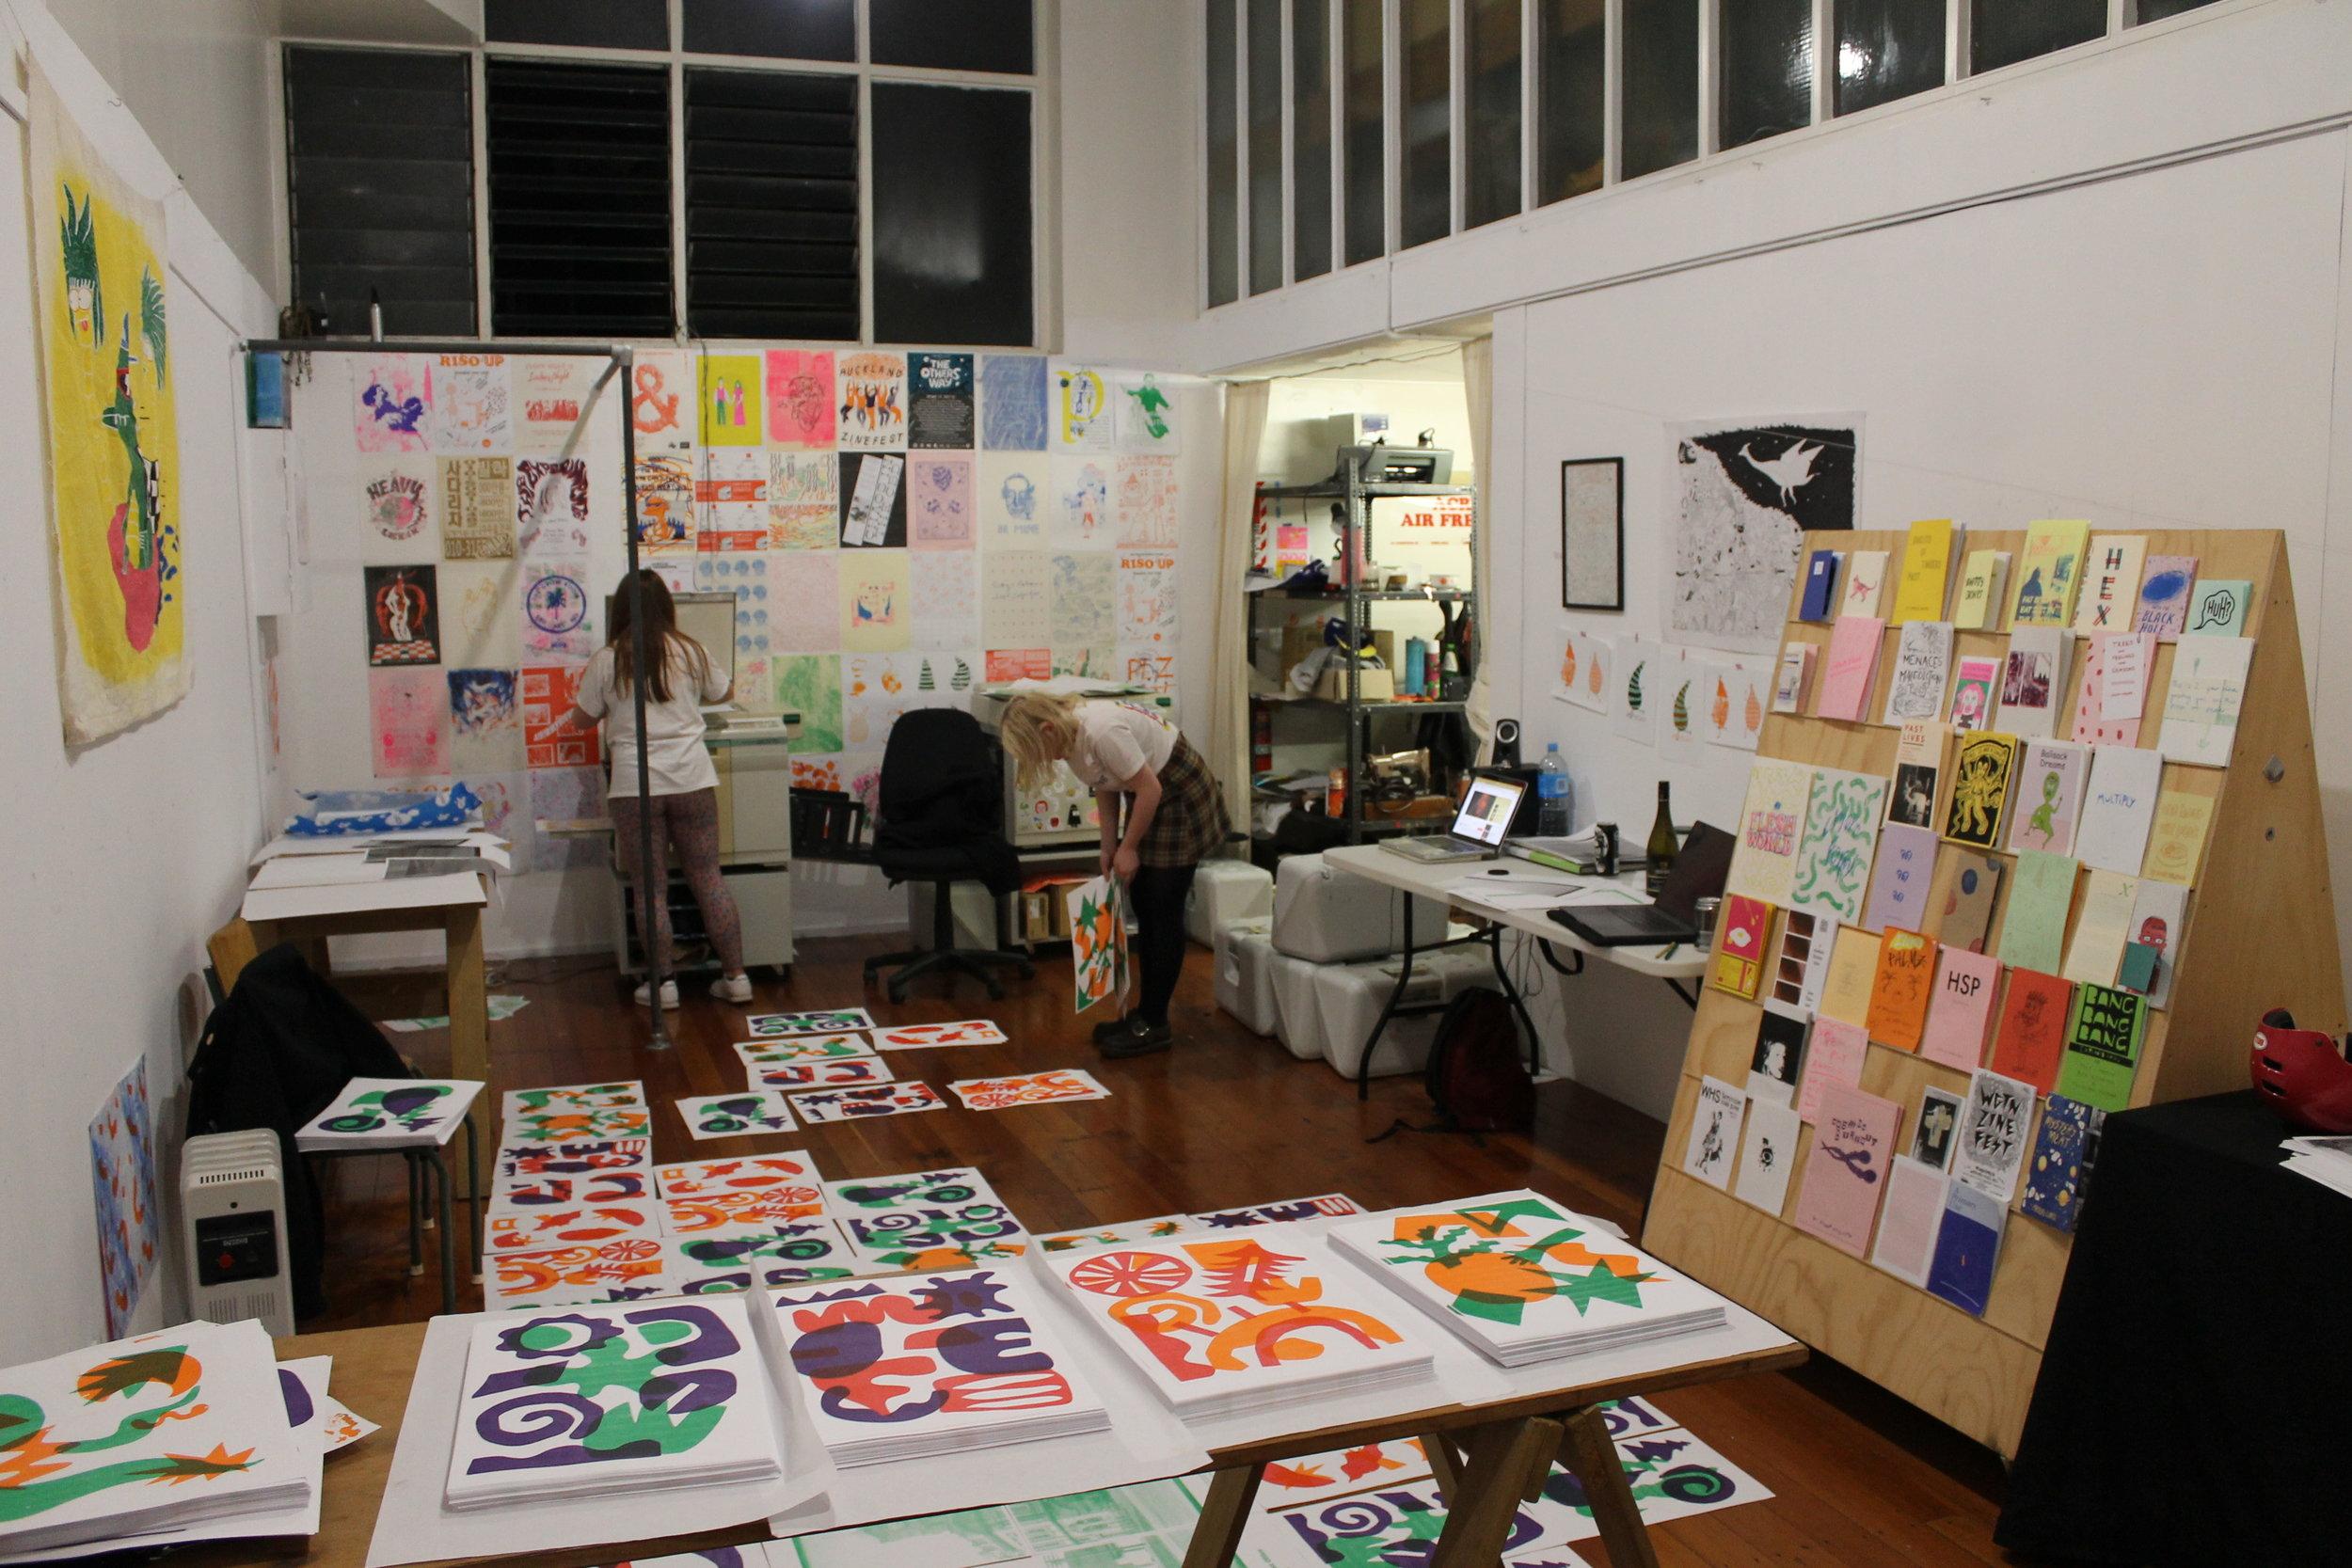 Above: Inky Palms studio, La Gonda Arcade, K Road.